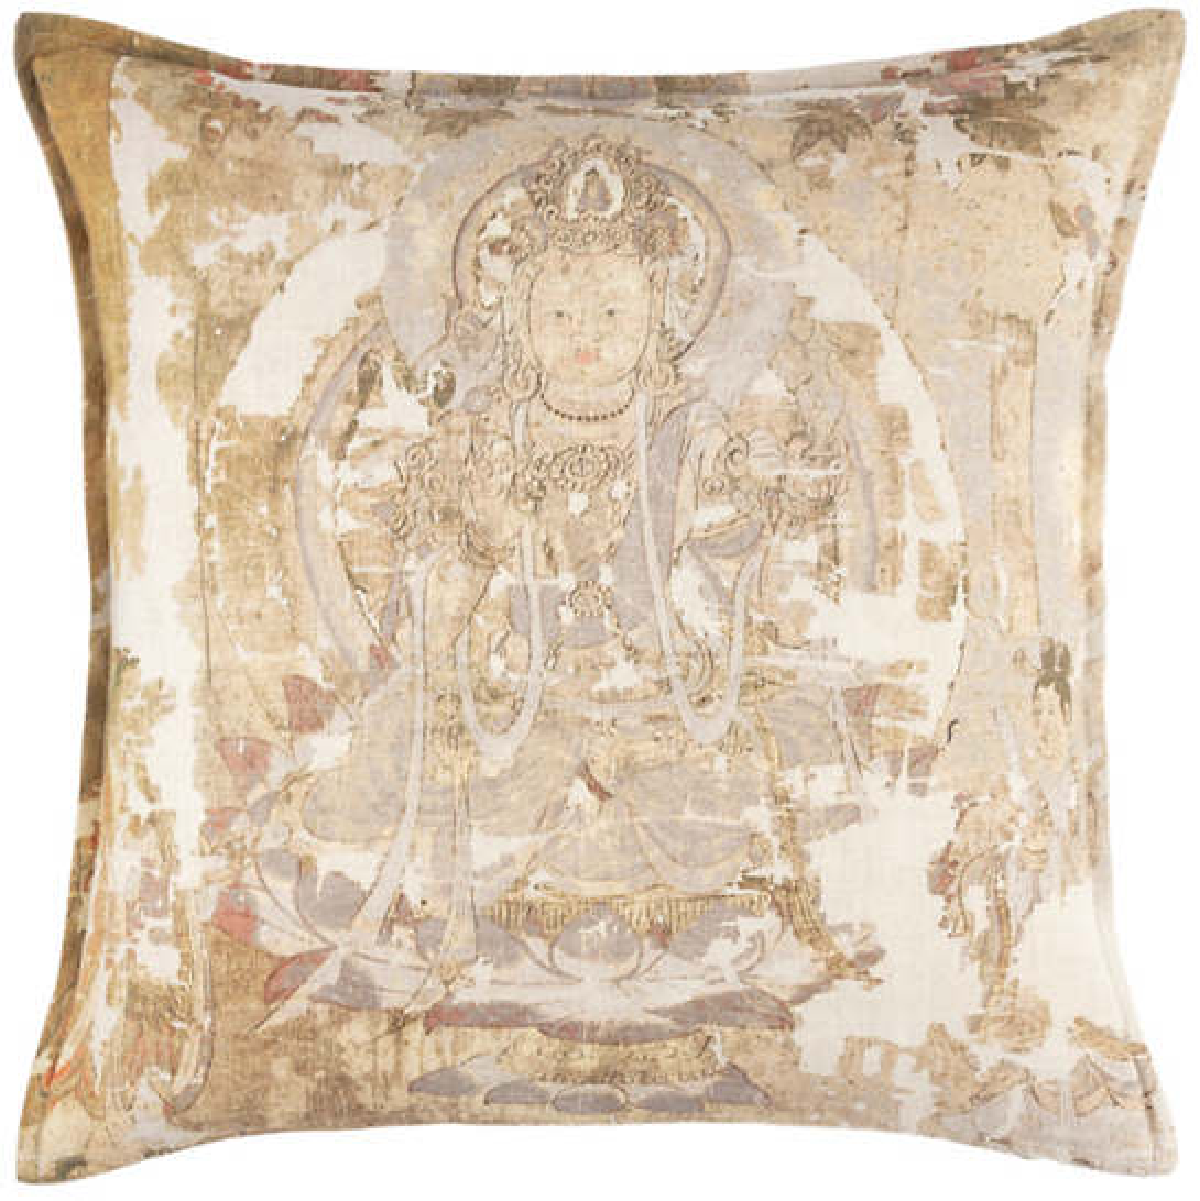 Chakra Linen Decorative Pillow